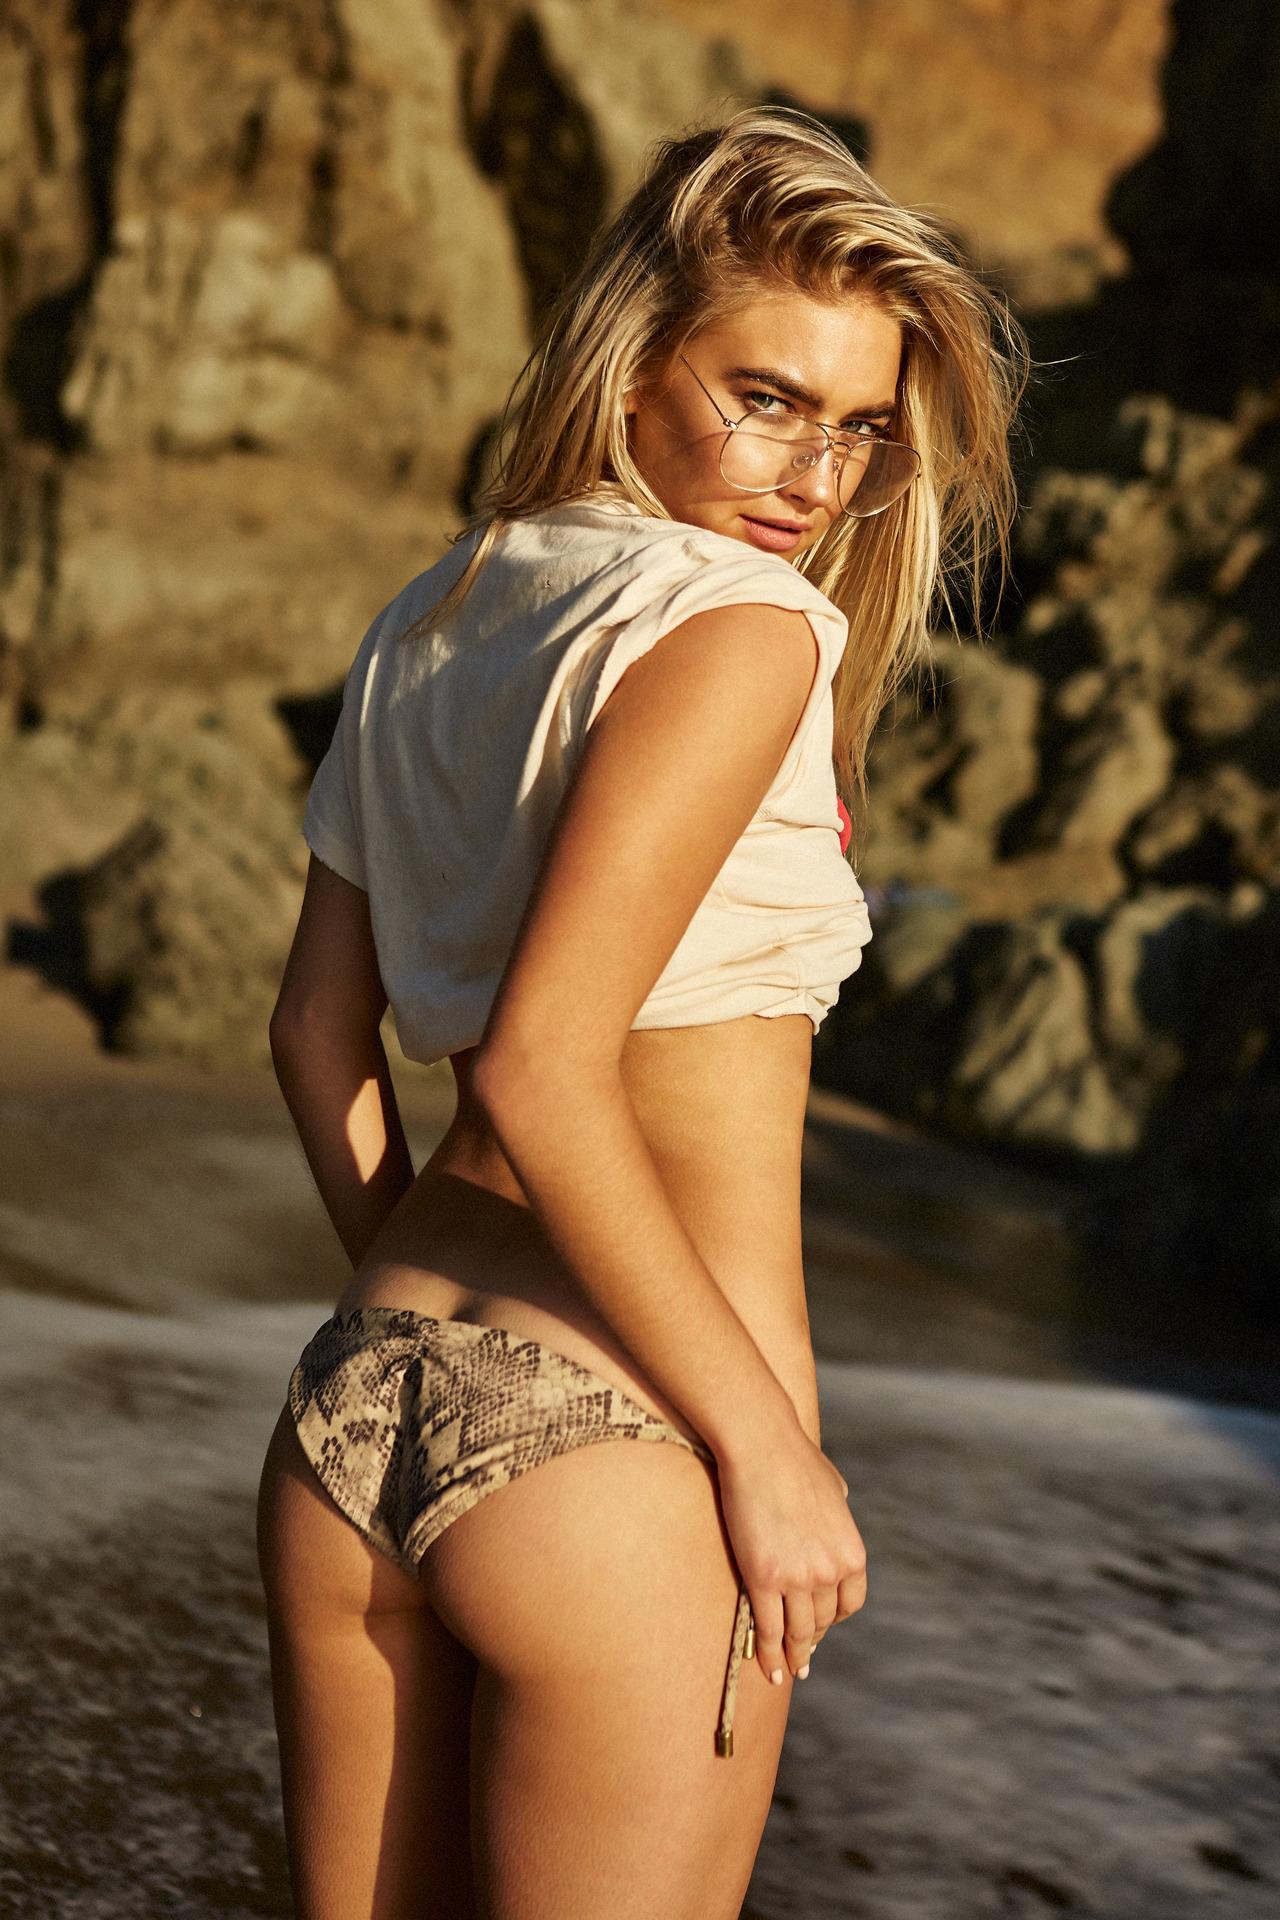 Selfie Tess Jantschek naked (19 photos), Tits, Is a cute, Feet, in bikini 2019